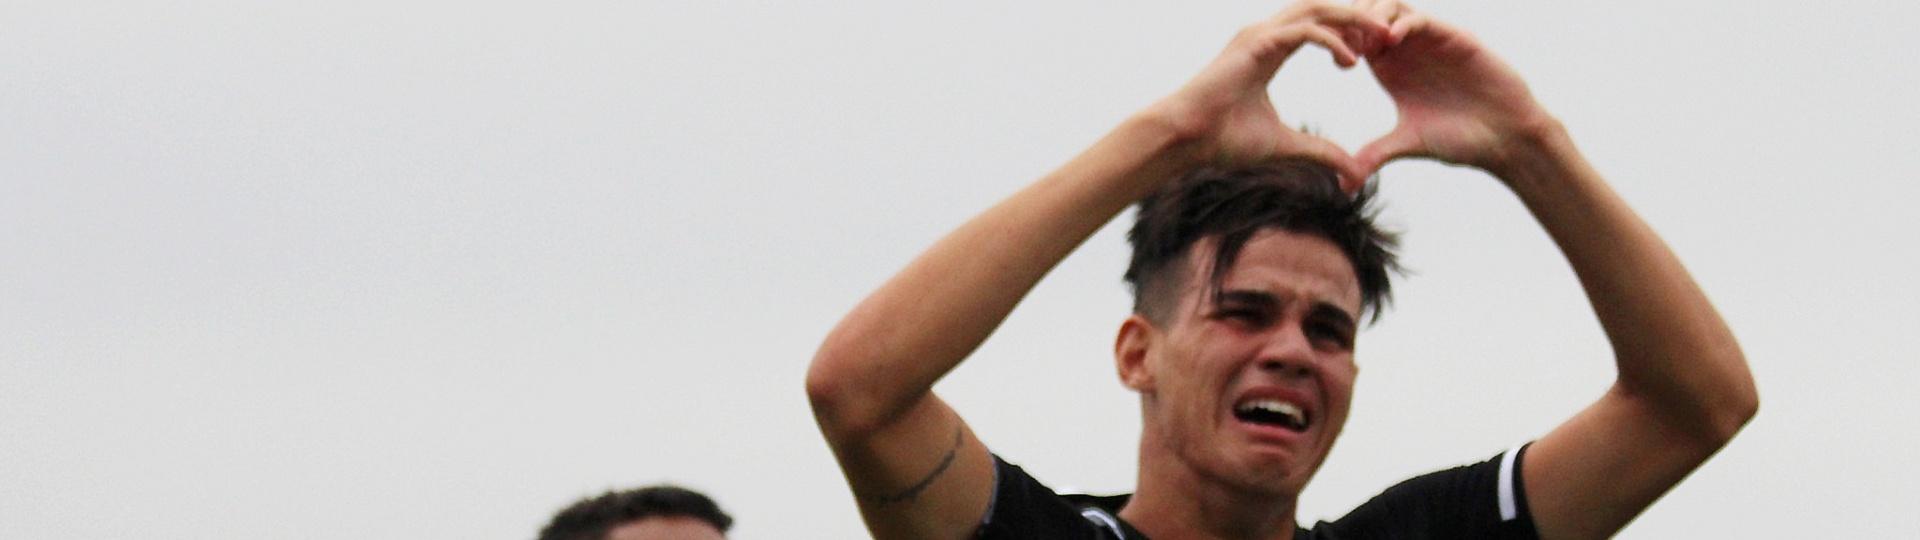 Matheus comemora gol do Vasco sobre o Espírito Santo na Copinha